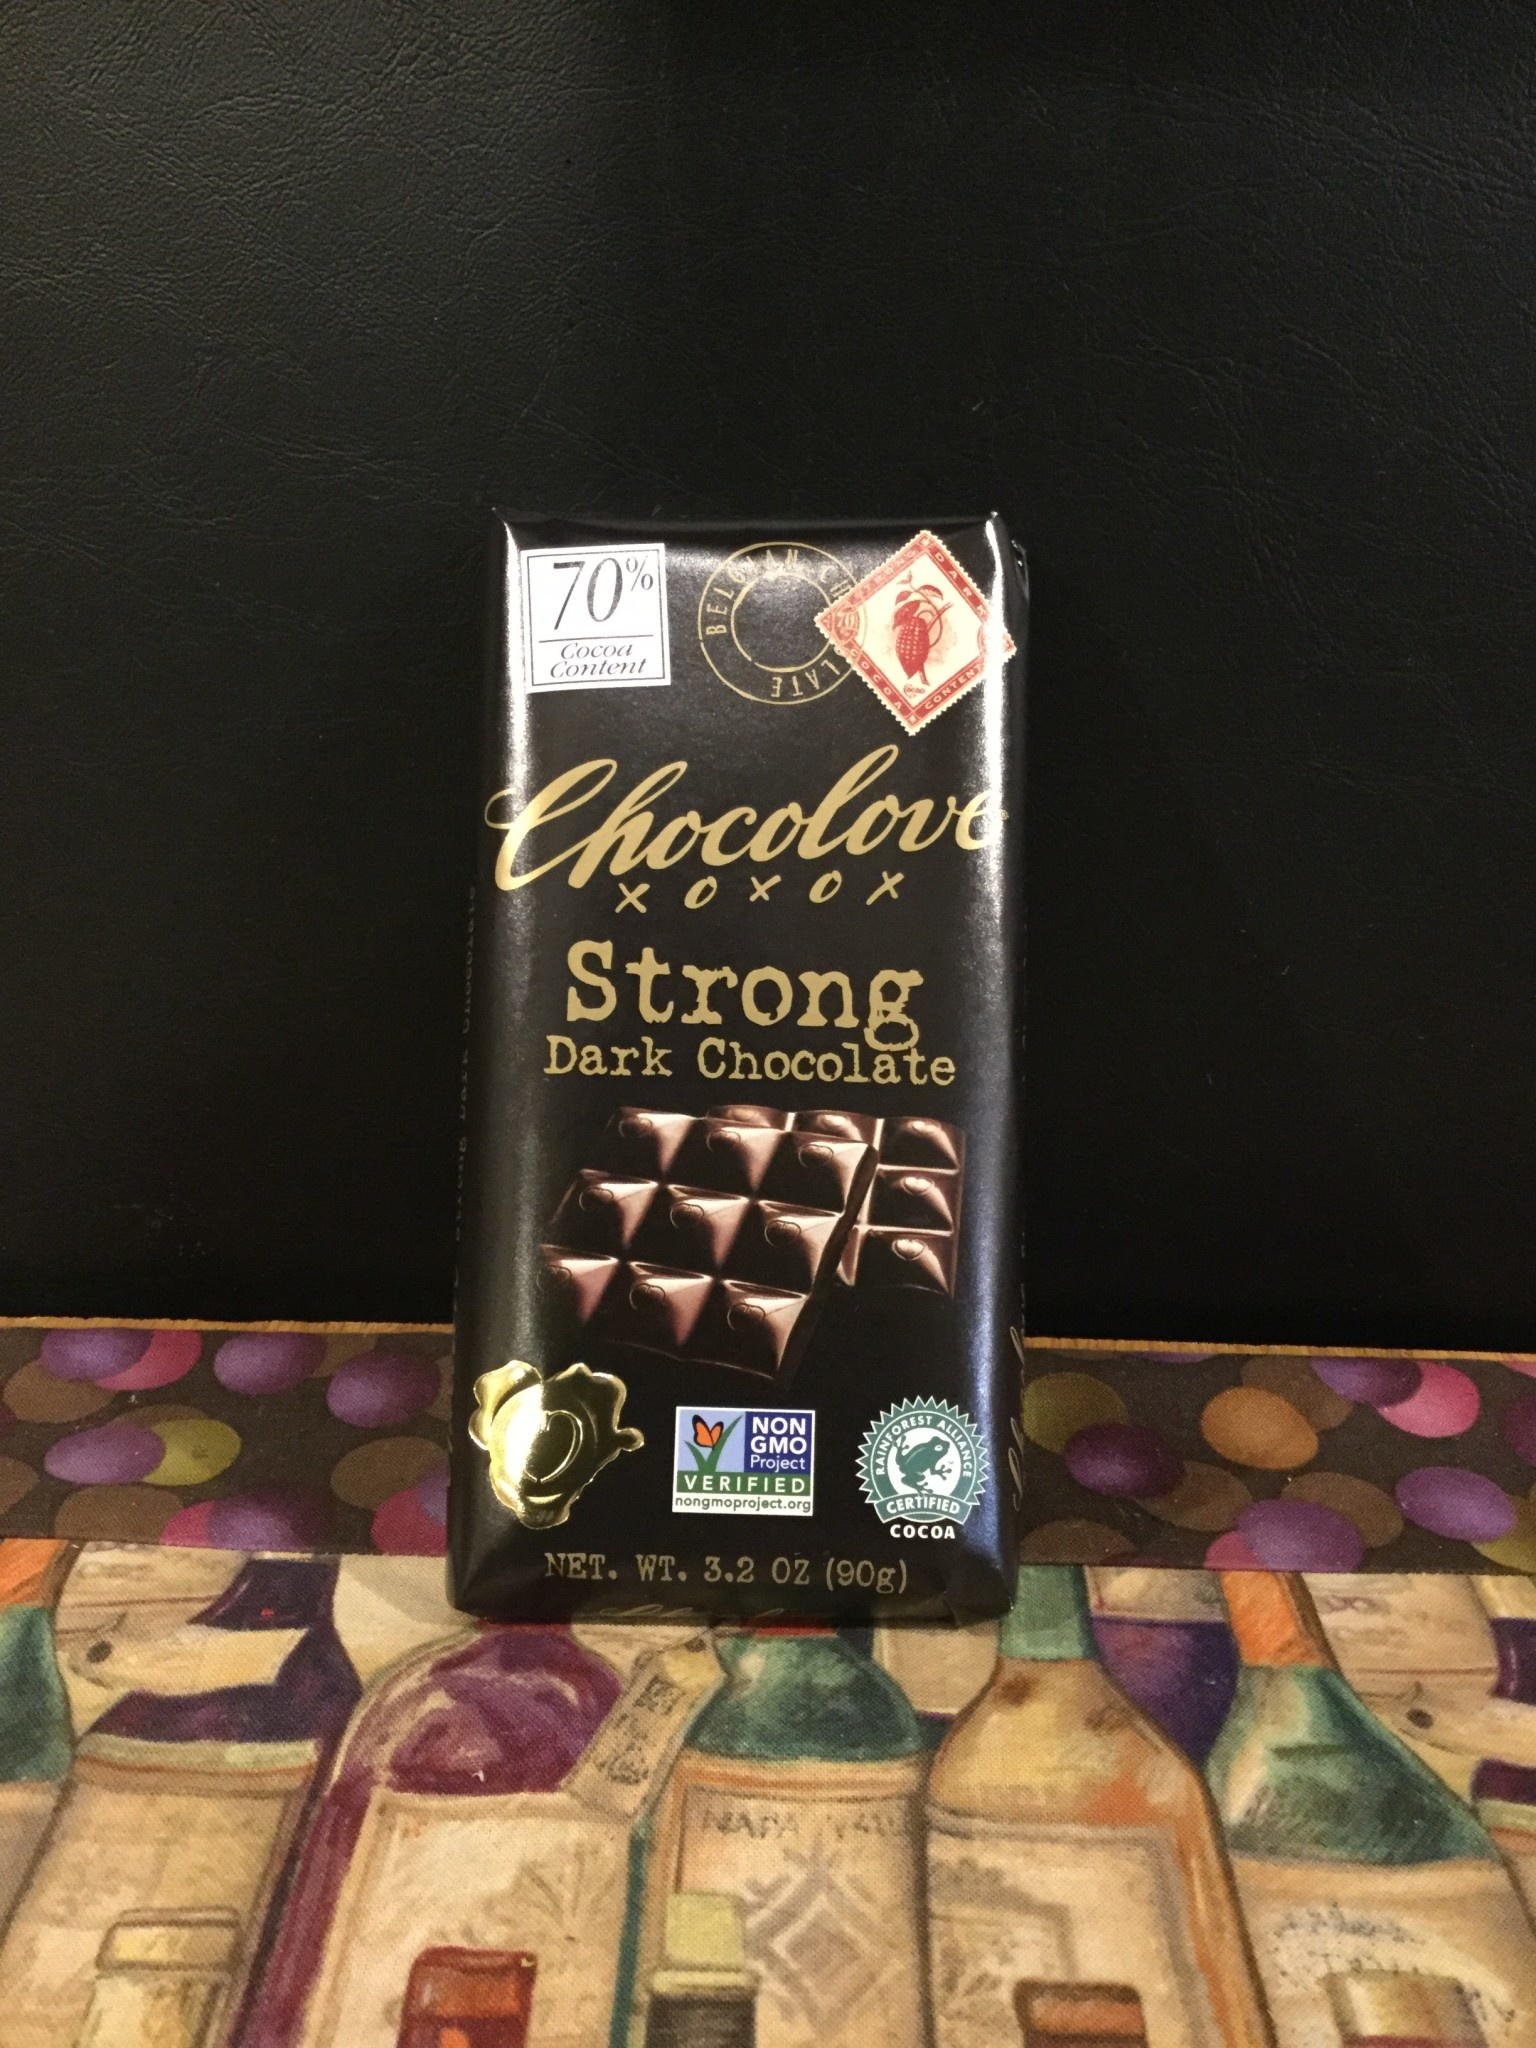 Chocolove Strong Dark Chocolate Bar